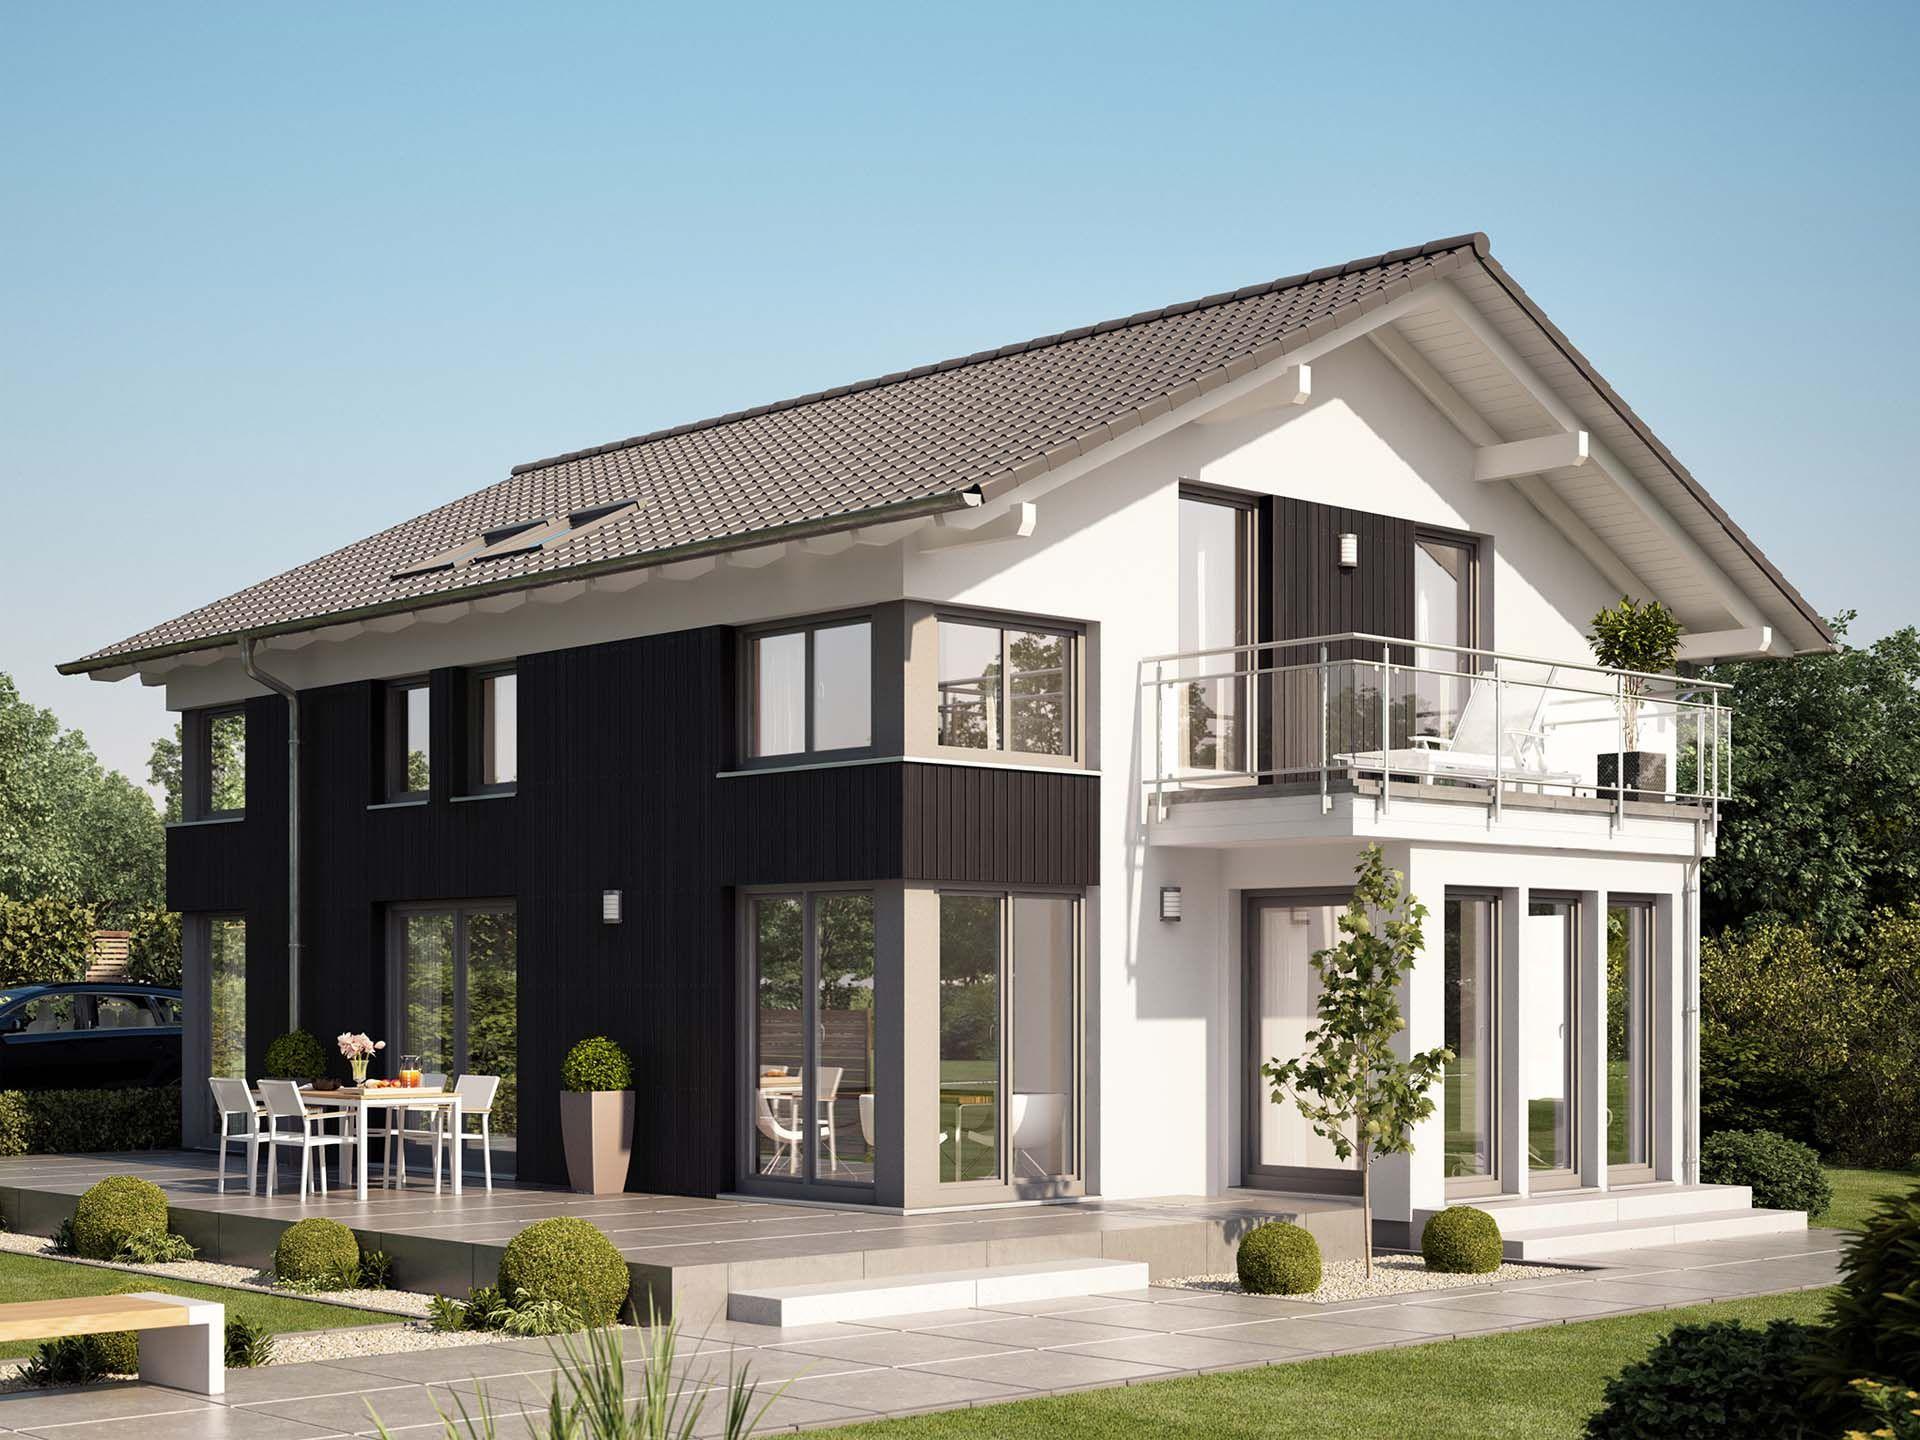 evolution 154 v3 einfamilienhaus von bien zenker. Black Bedroom Furniture Sets. Home Design Ideas